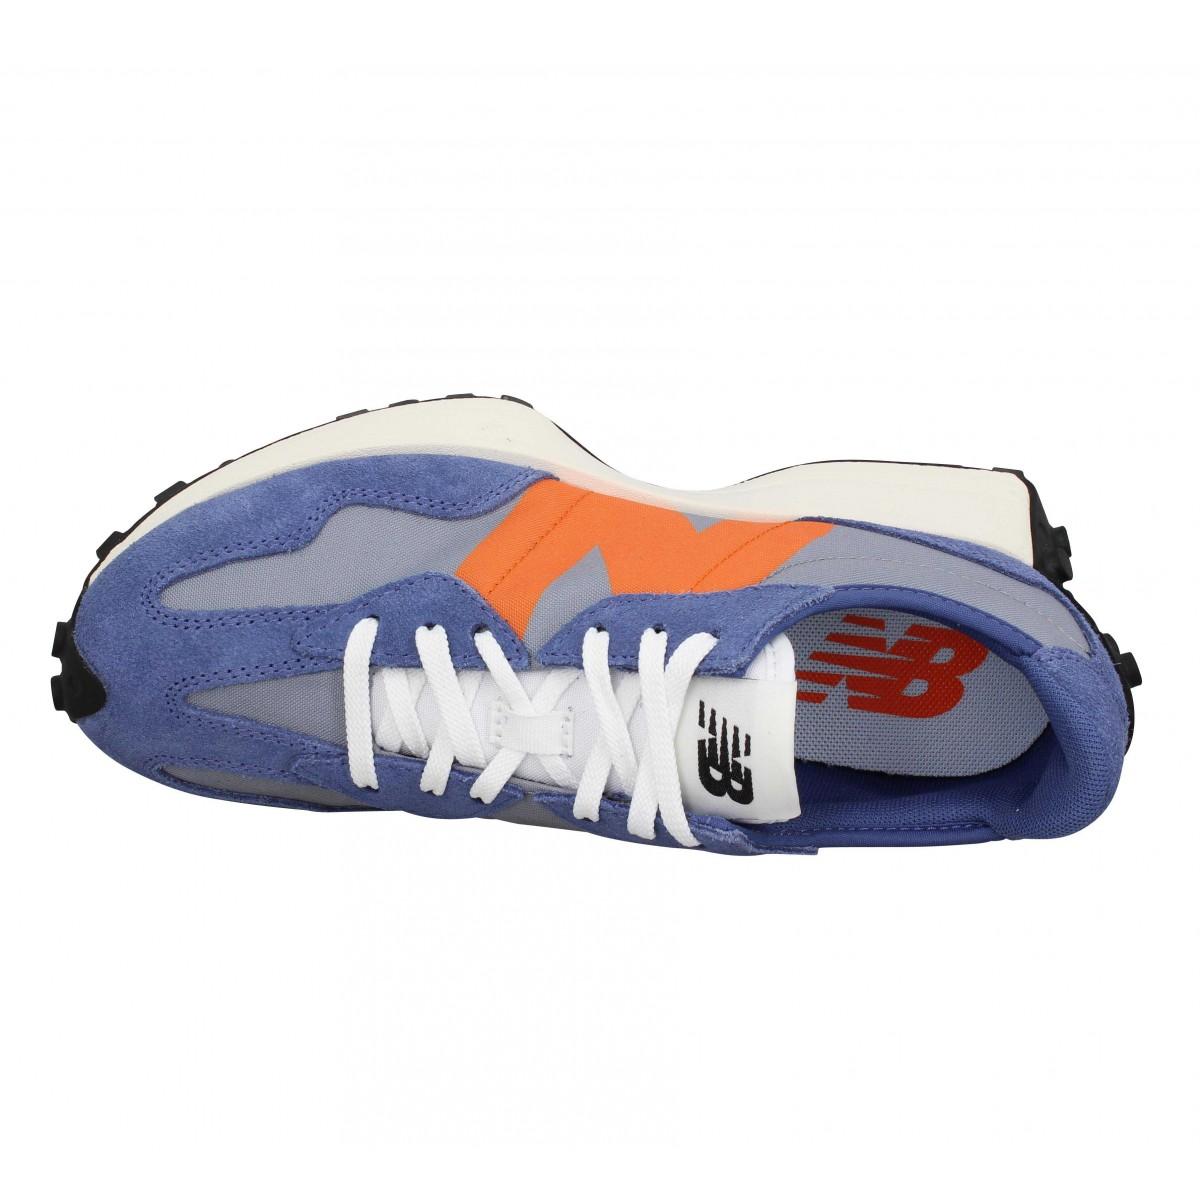 Chaussures New balance 327 velours toile femme bleu orange femme ...